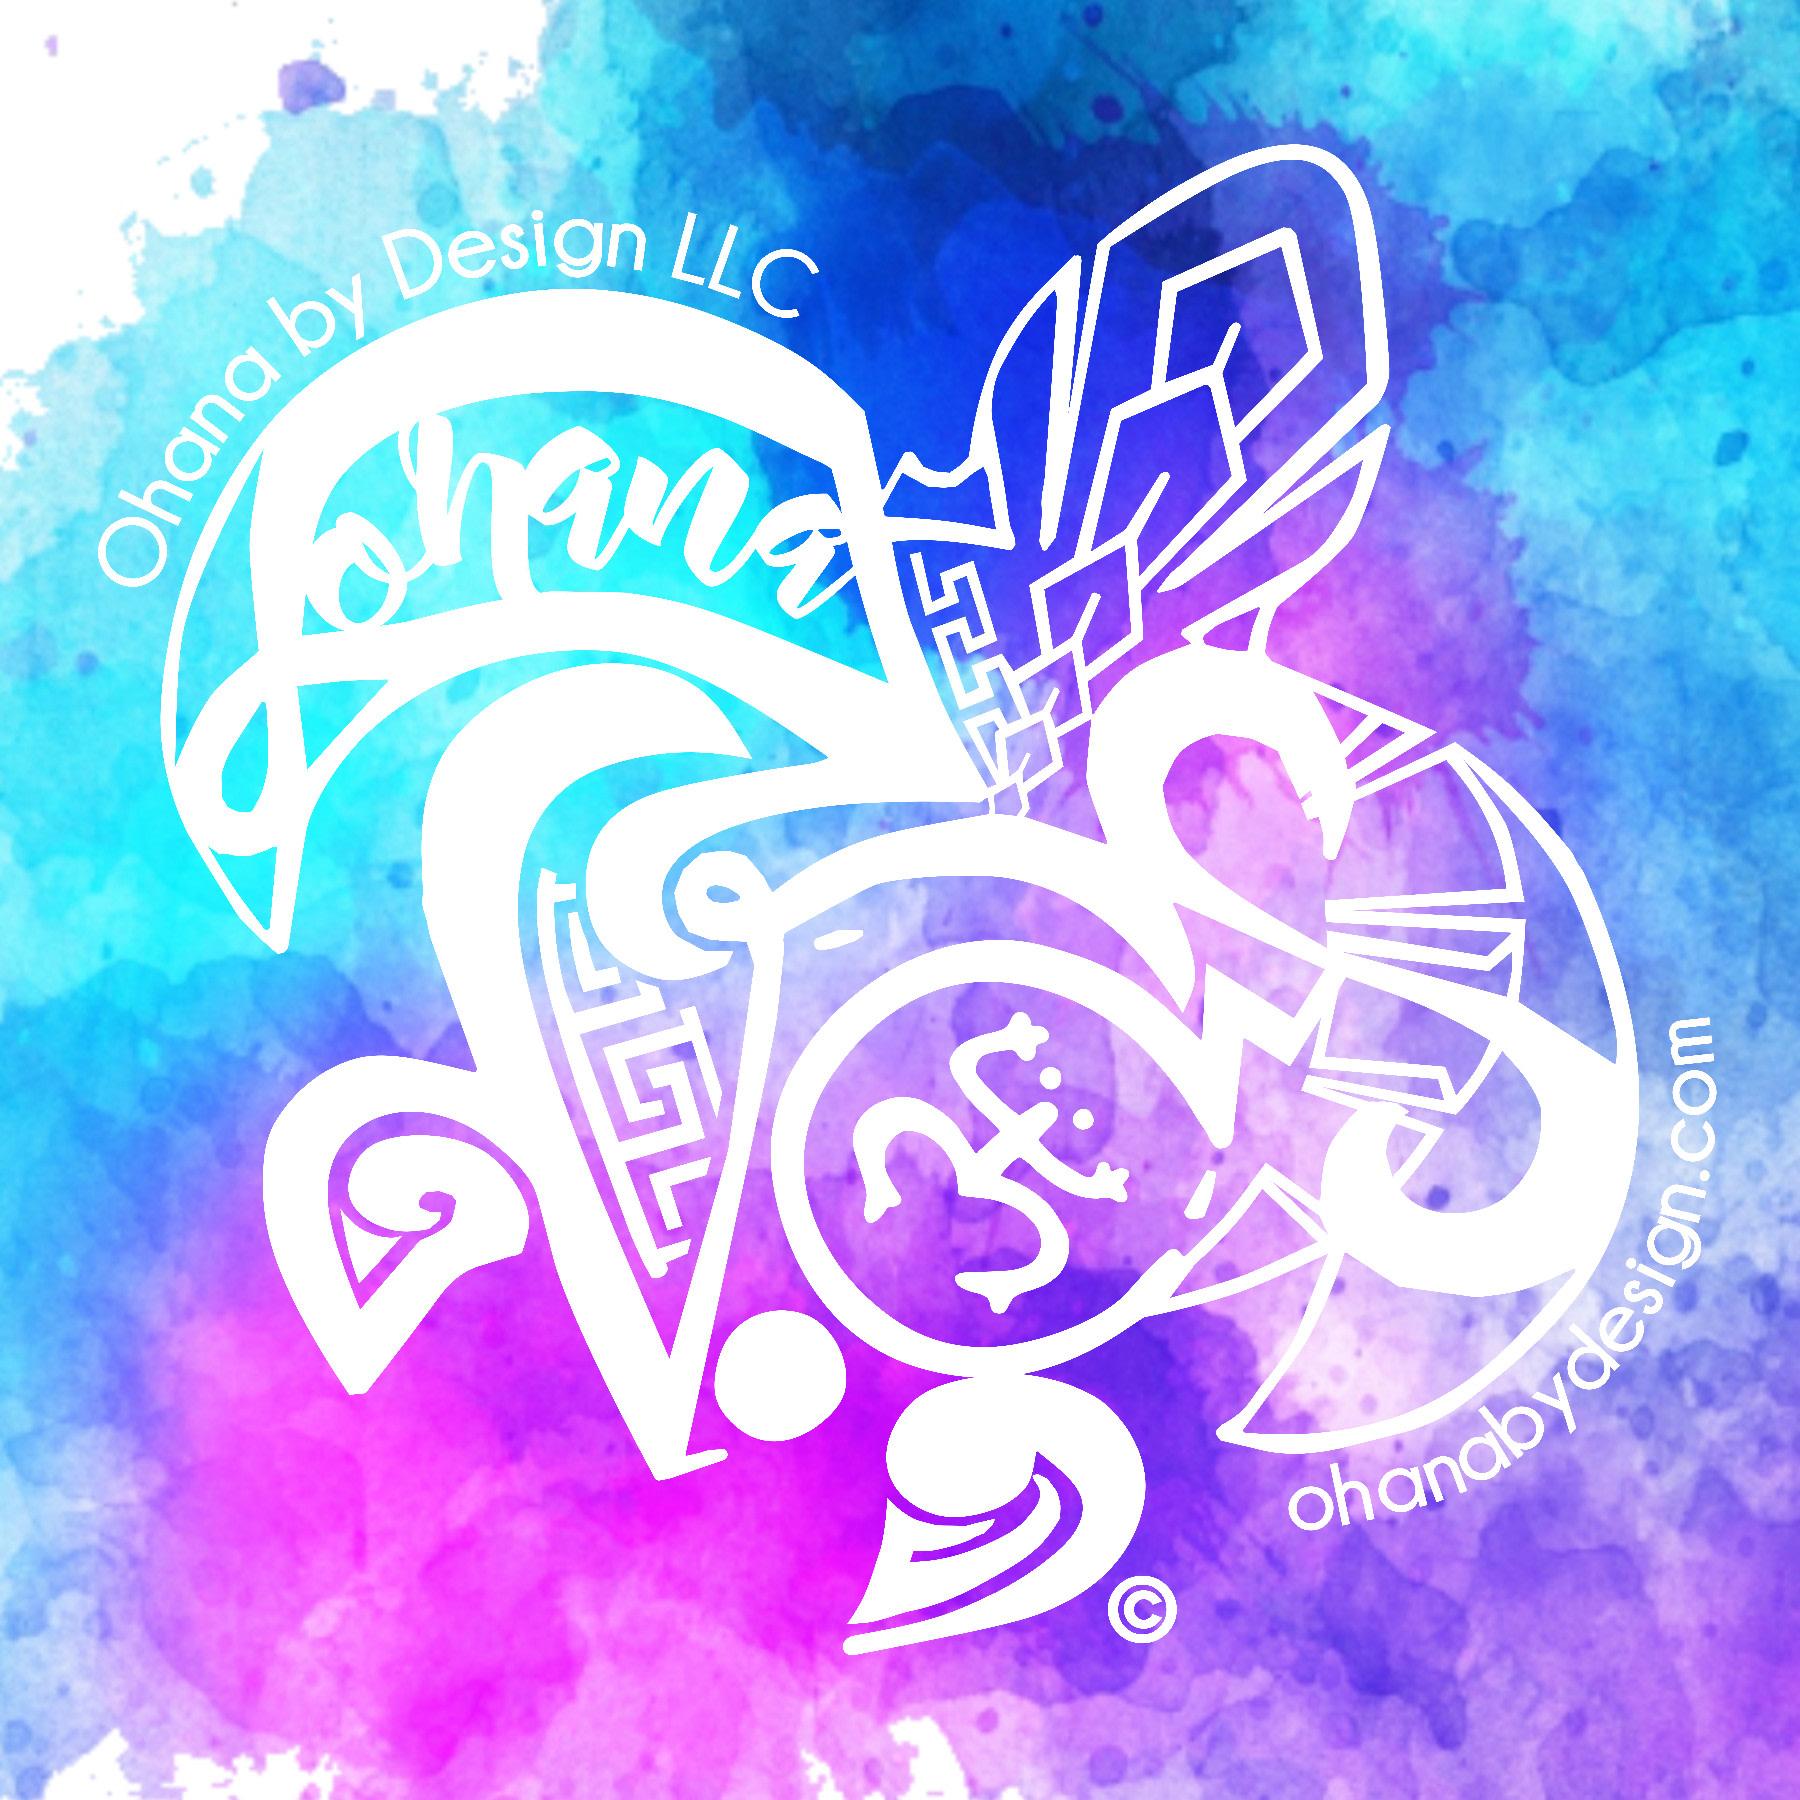 Ohana By Design LLC